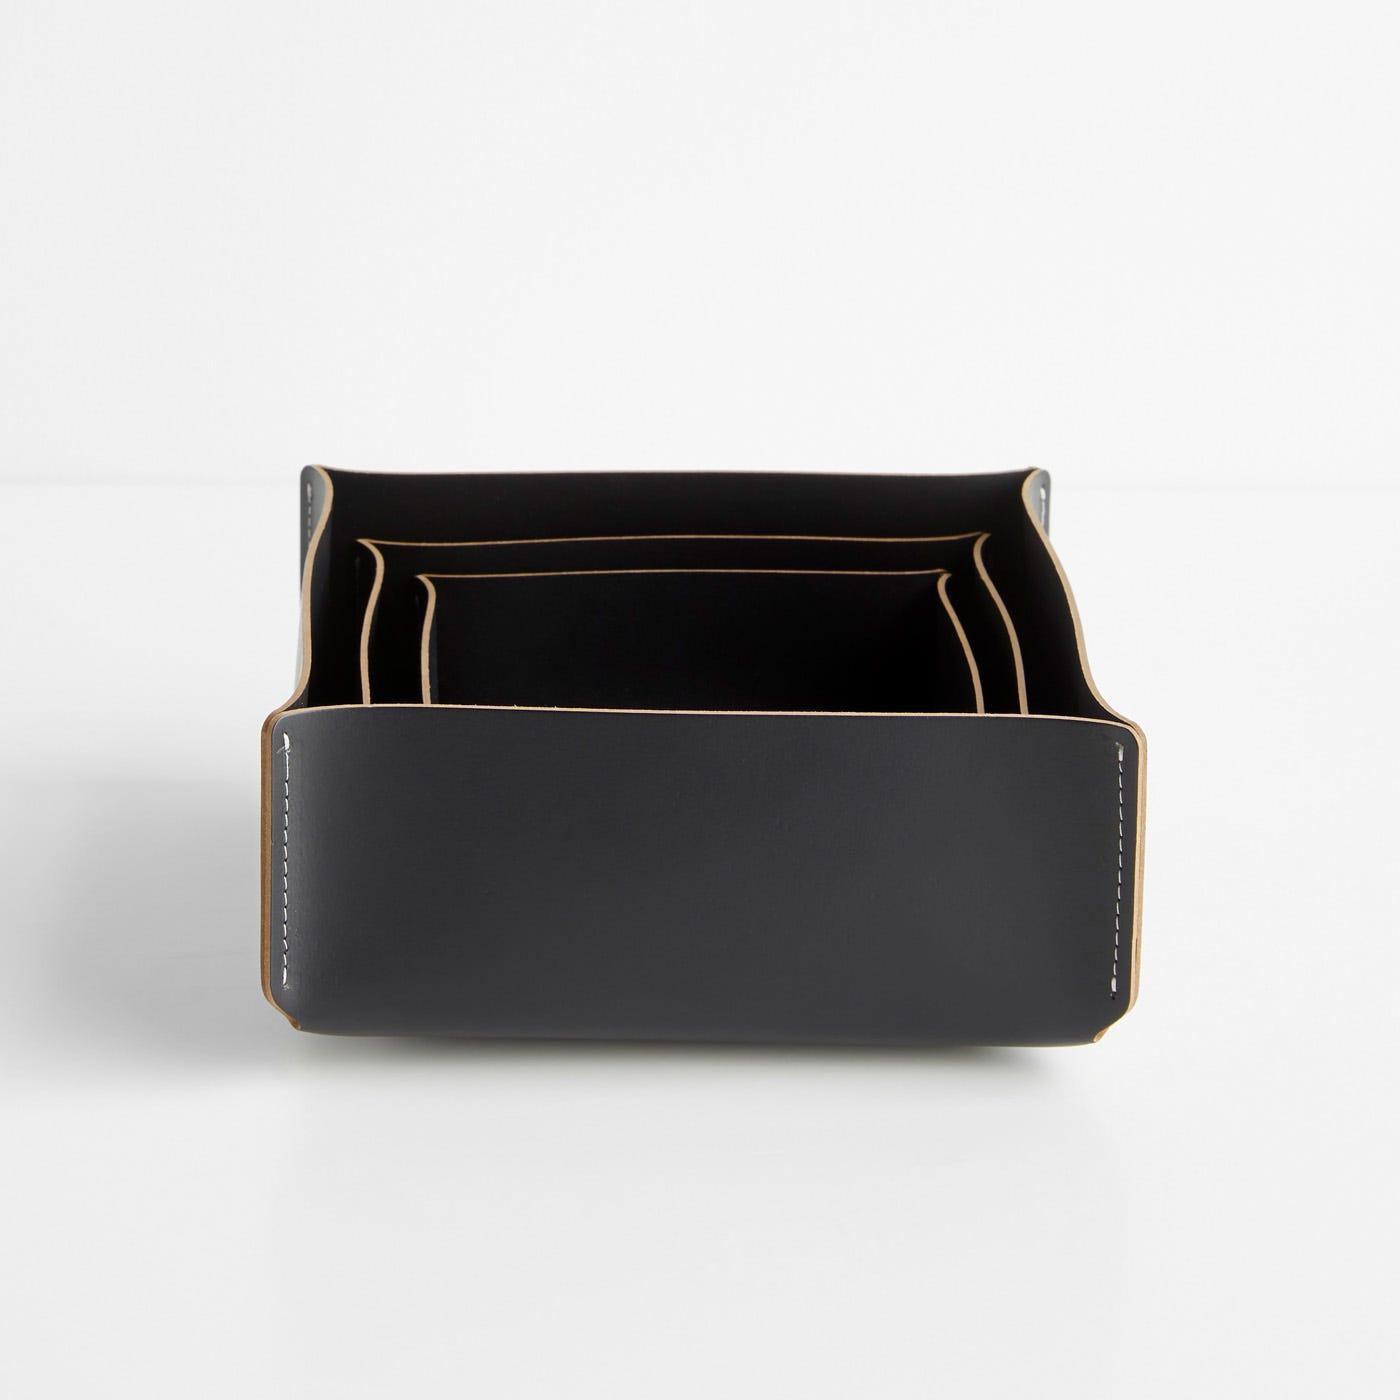 Square Black Leather Storage Bins Set of 3